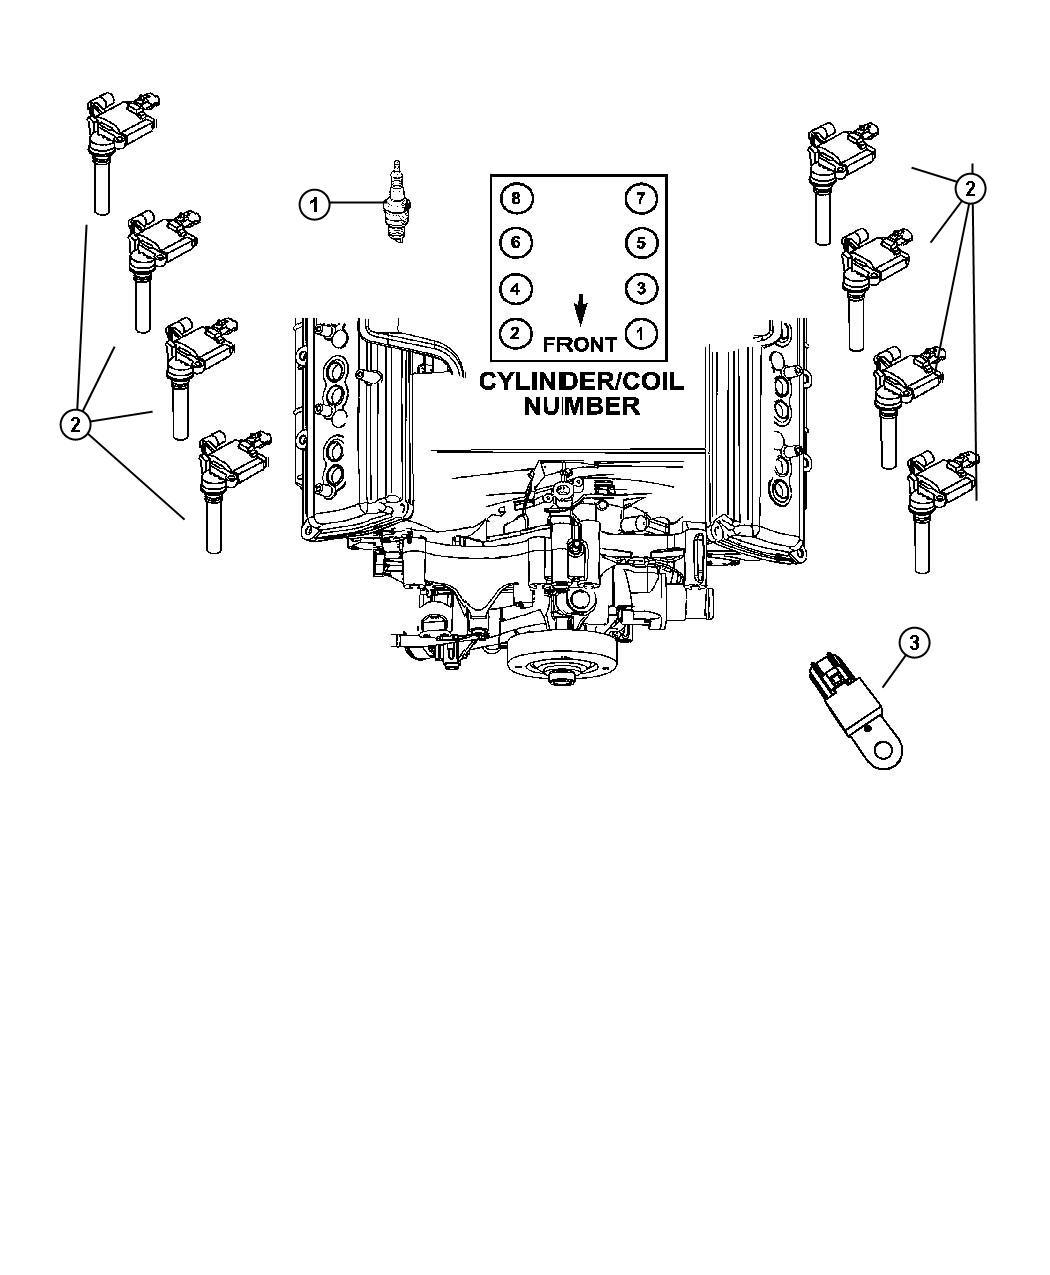 Jeep Grand Cherokee Spark Plug Ignition Plugs Engine